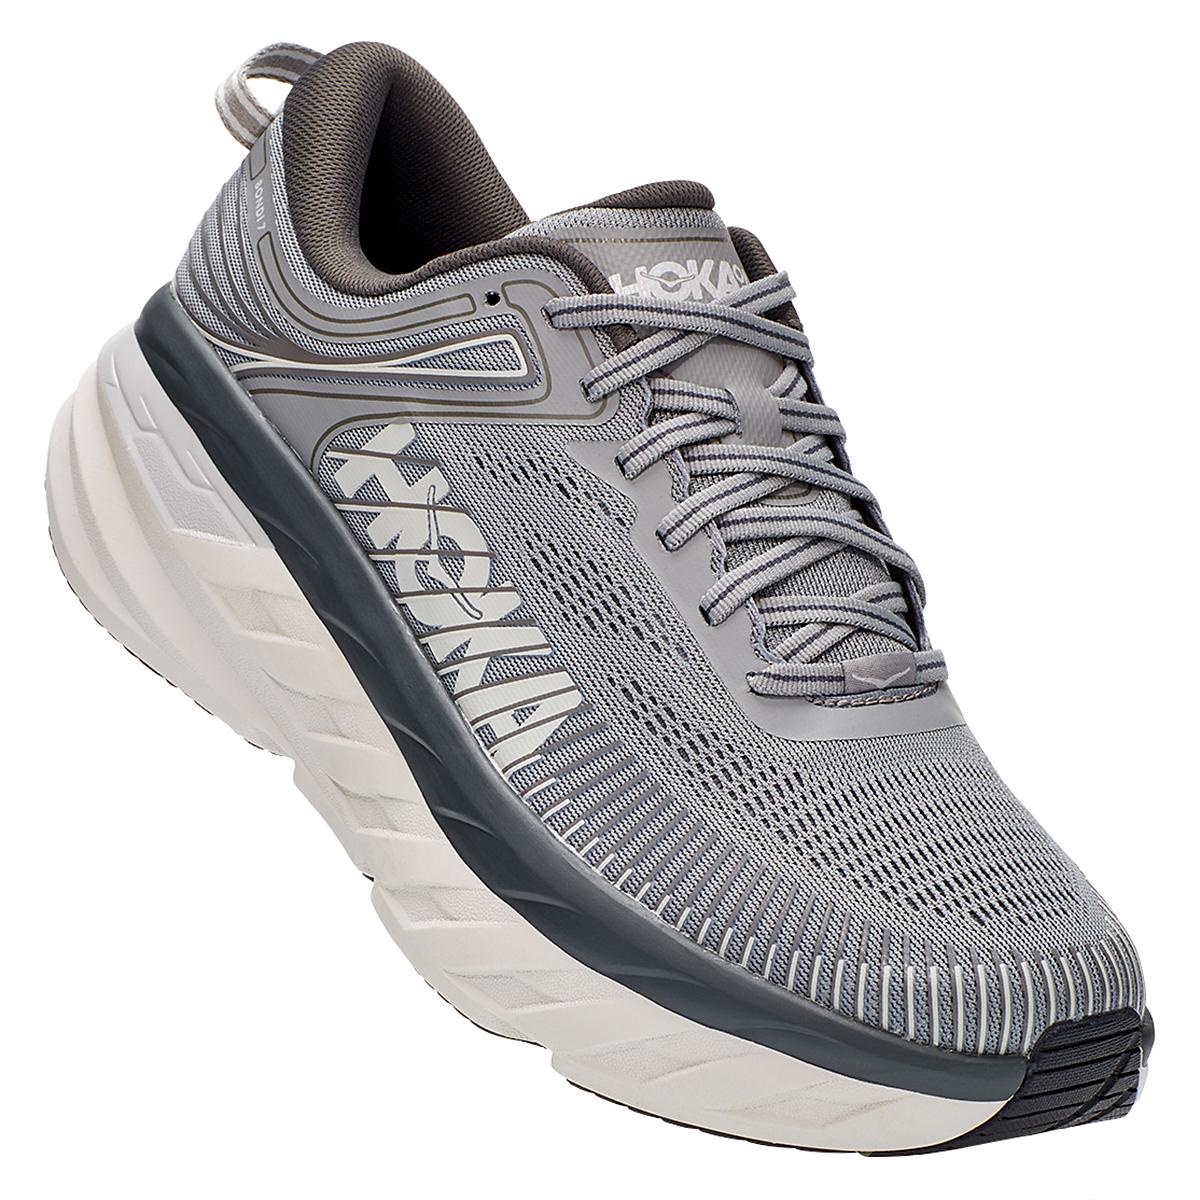 Men's Hoka One One Bondi 7 Running Shoe - Color: Wild Dove/Dark Shadow - Size: 7 - Width: Regular, Wild Dove/Dark Shadow, large, image 2